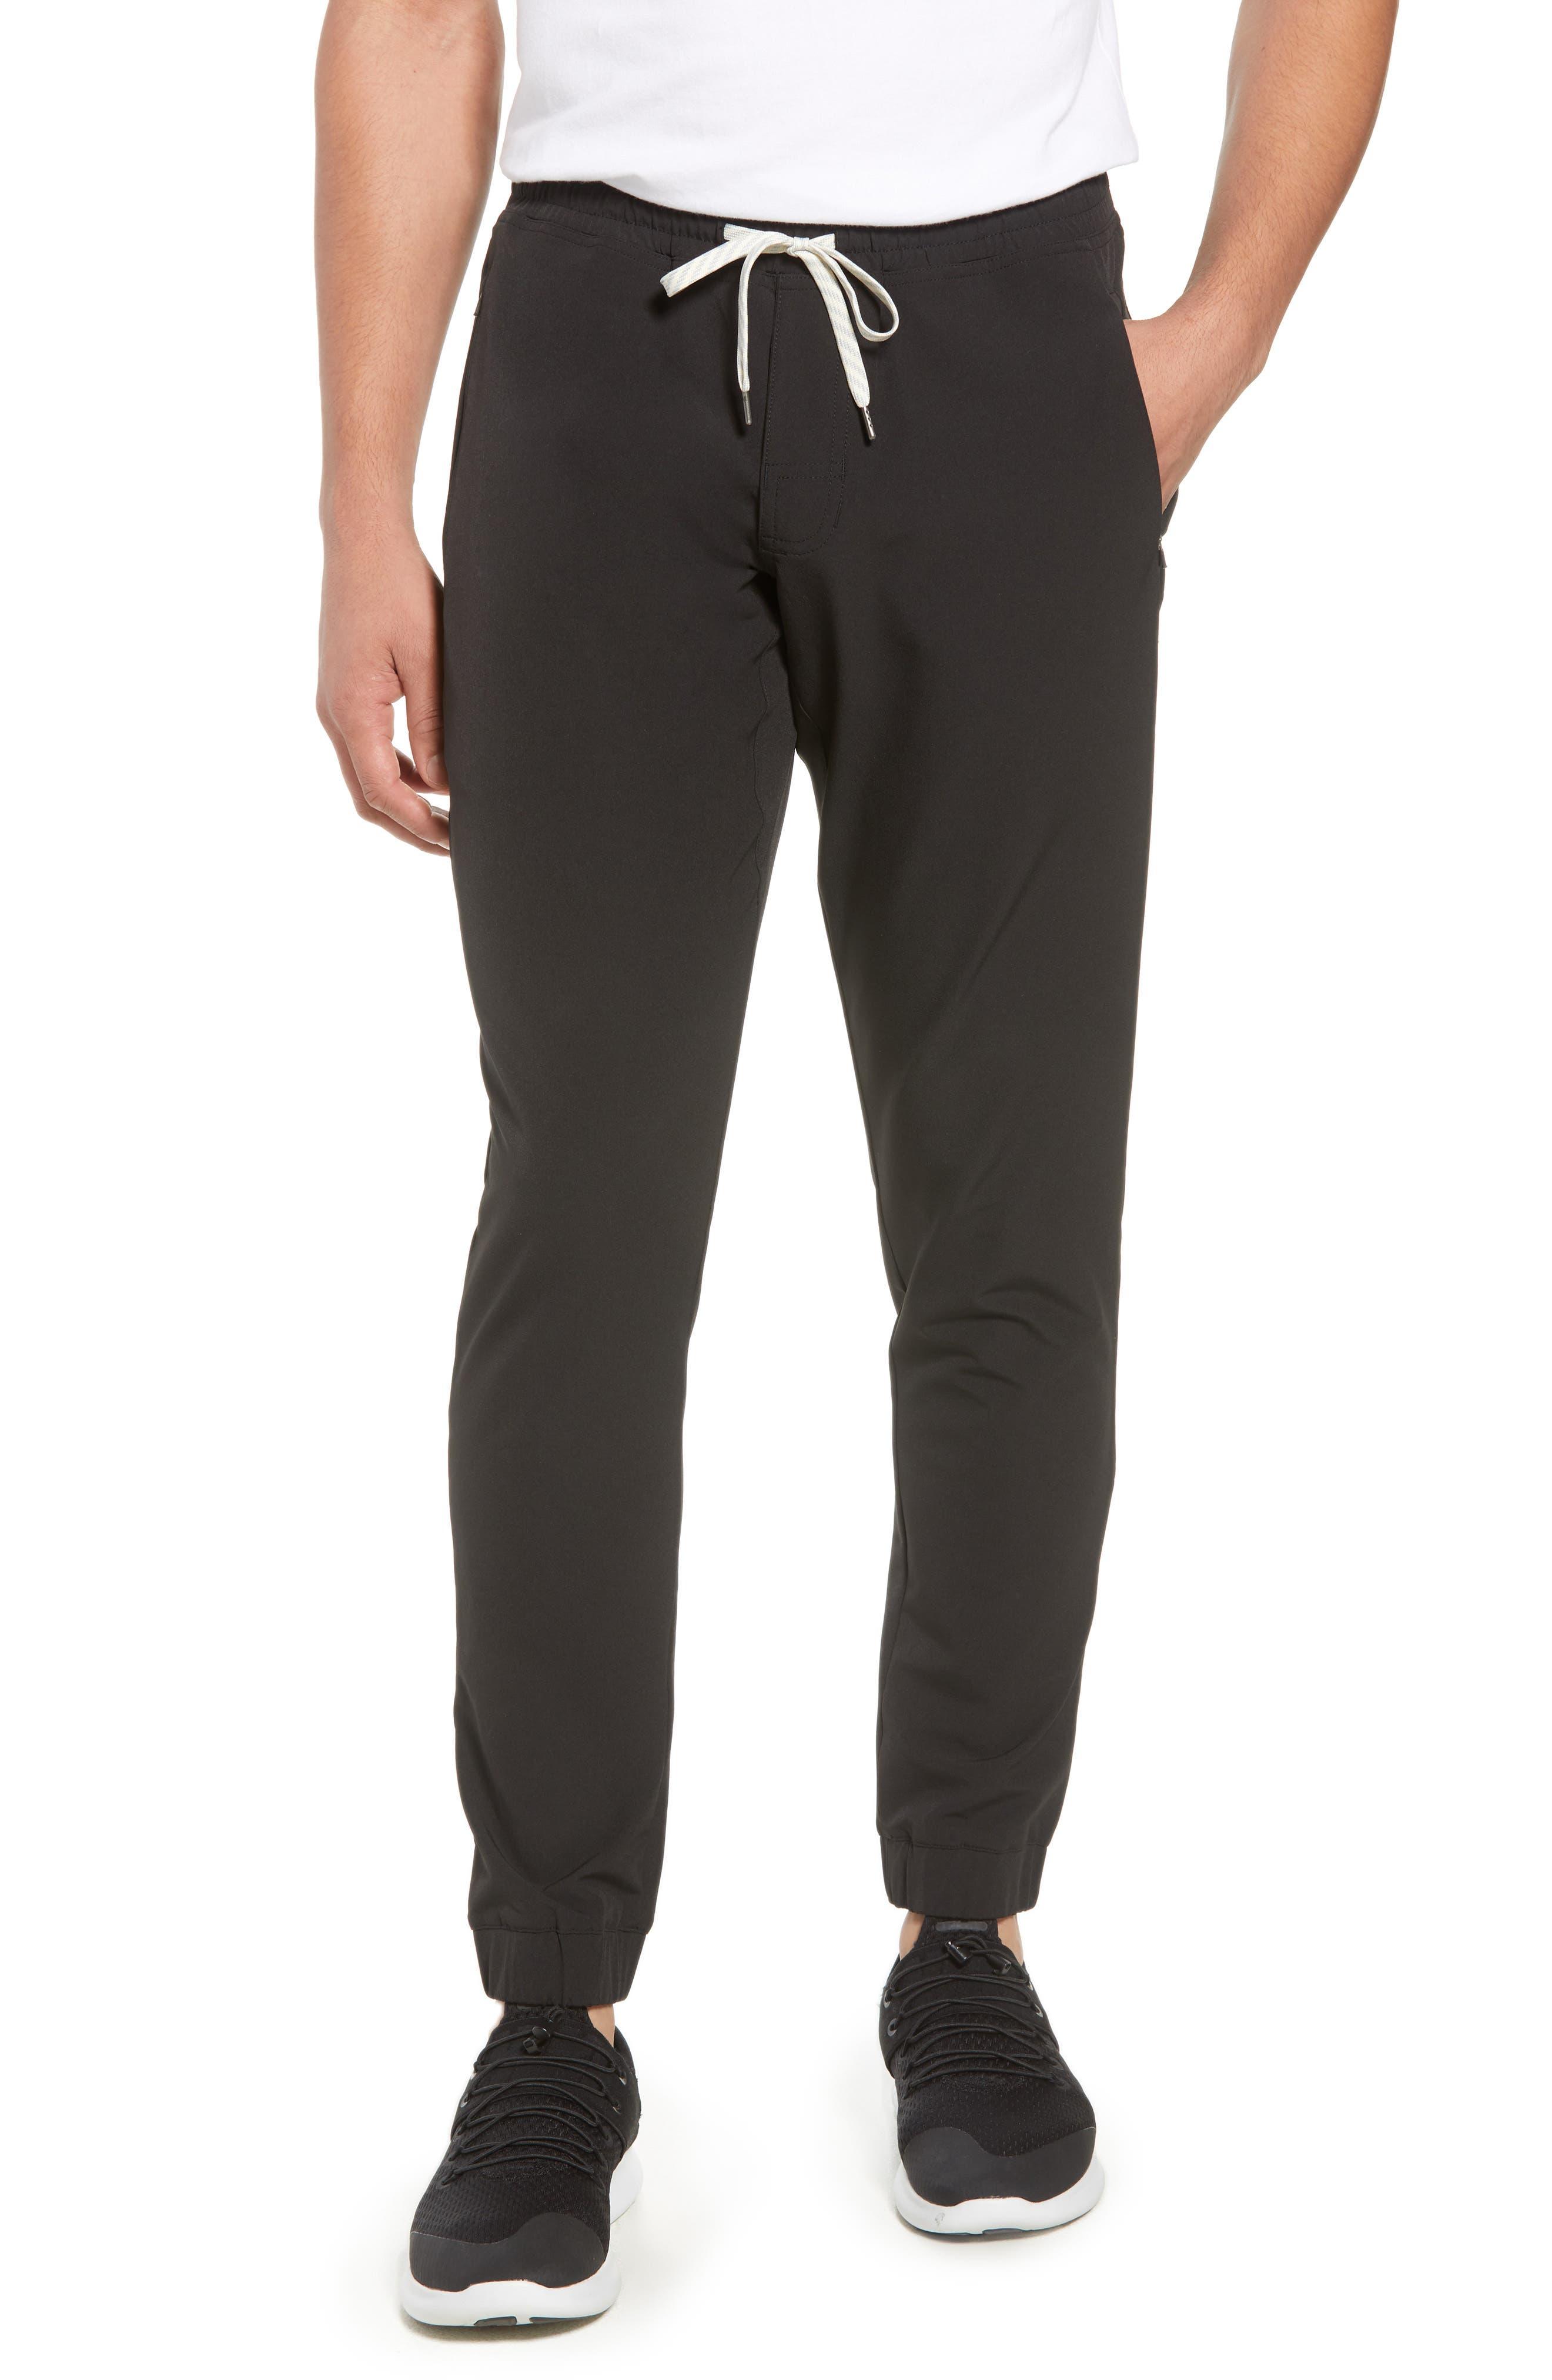 Transit Jogger Pants,                         Main,                         color, Black